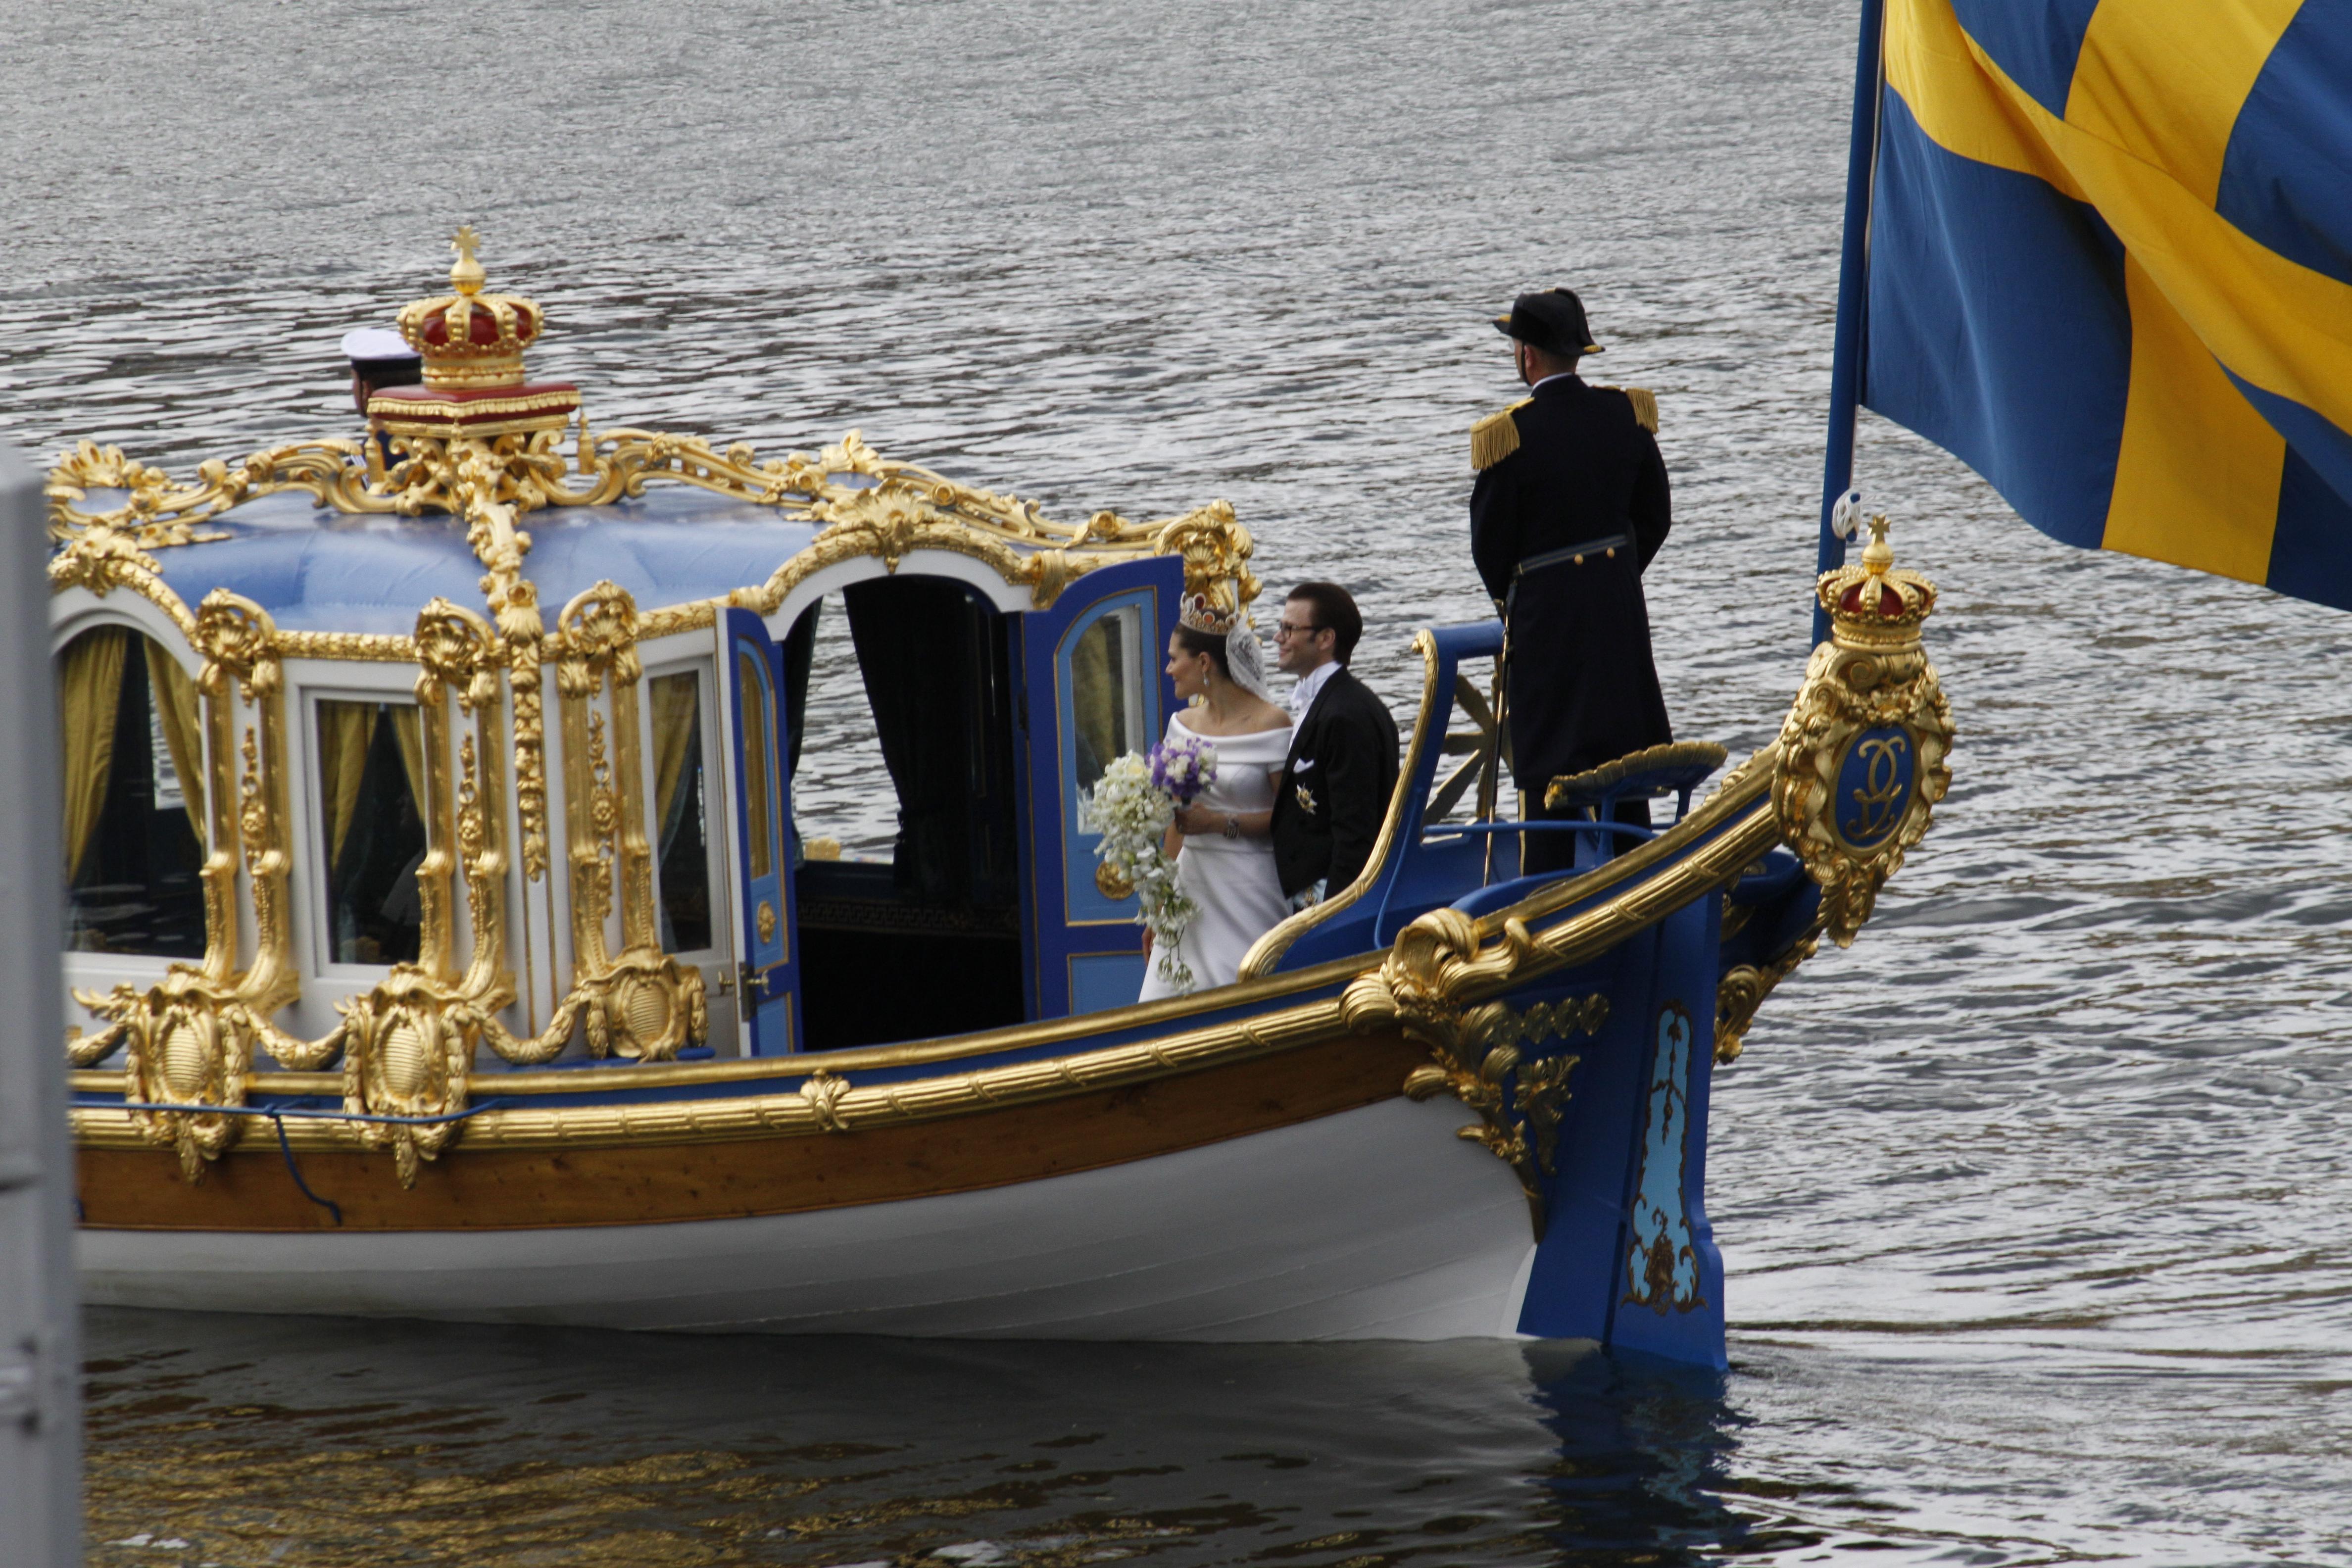 Description Royal Wedding Stockholm 2010 0c176 2129.jpg